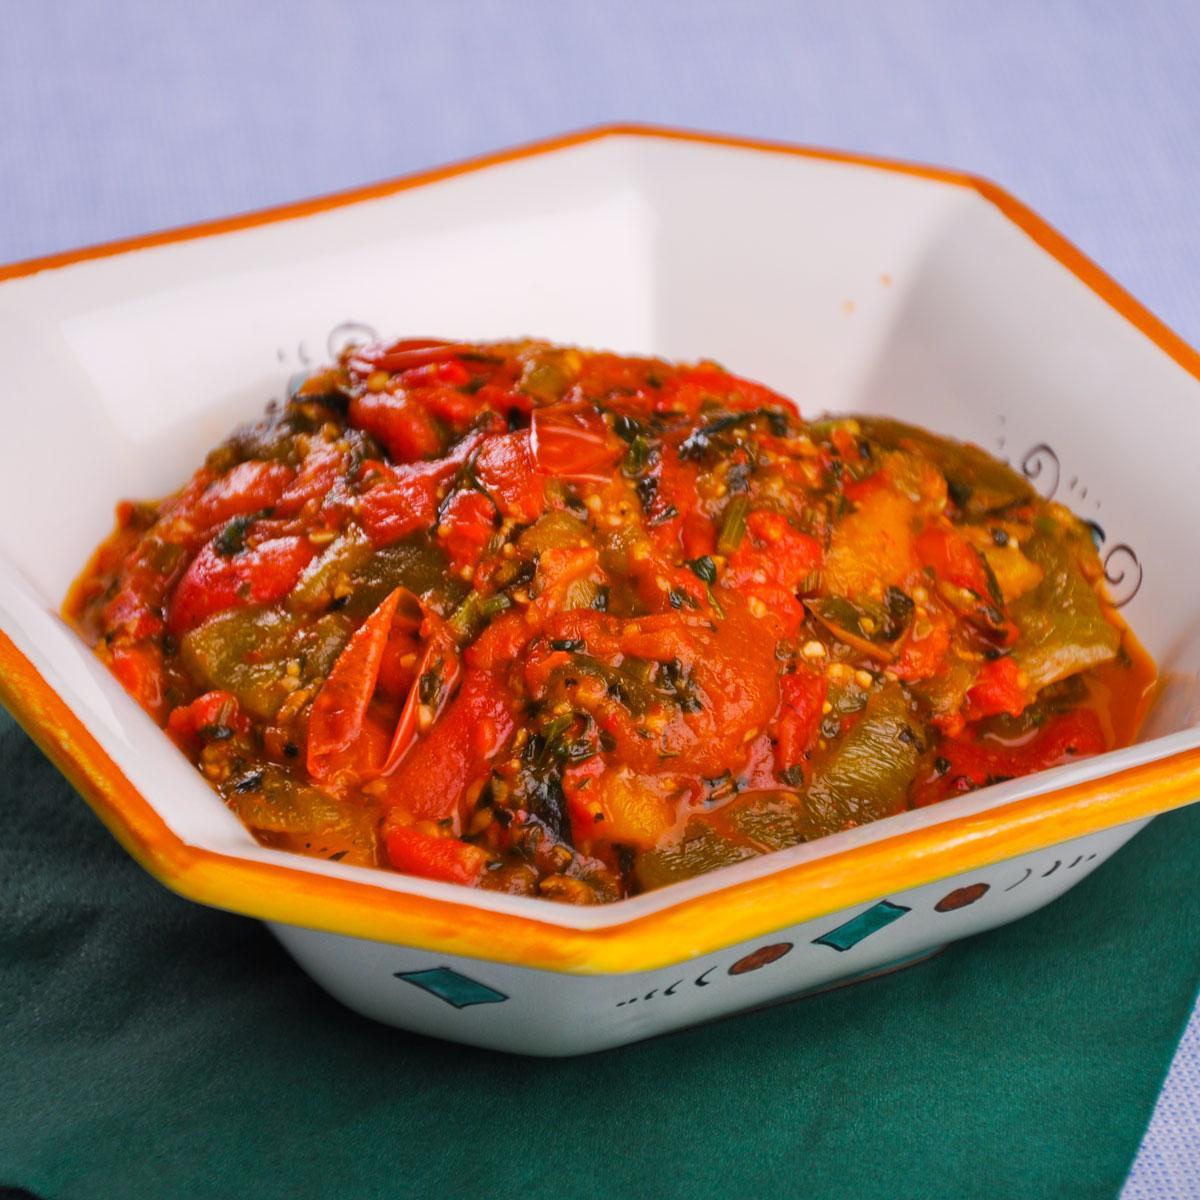 recette salade marocaine aux poivrons cuisine madame. Black Bedroom Furniture Sets. Home Design Ideas